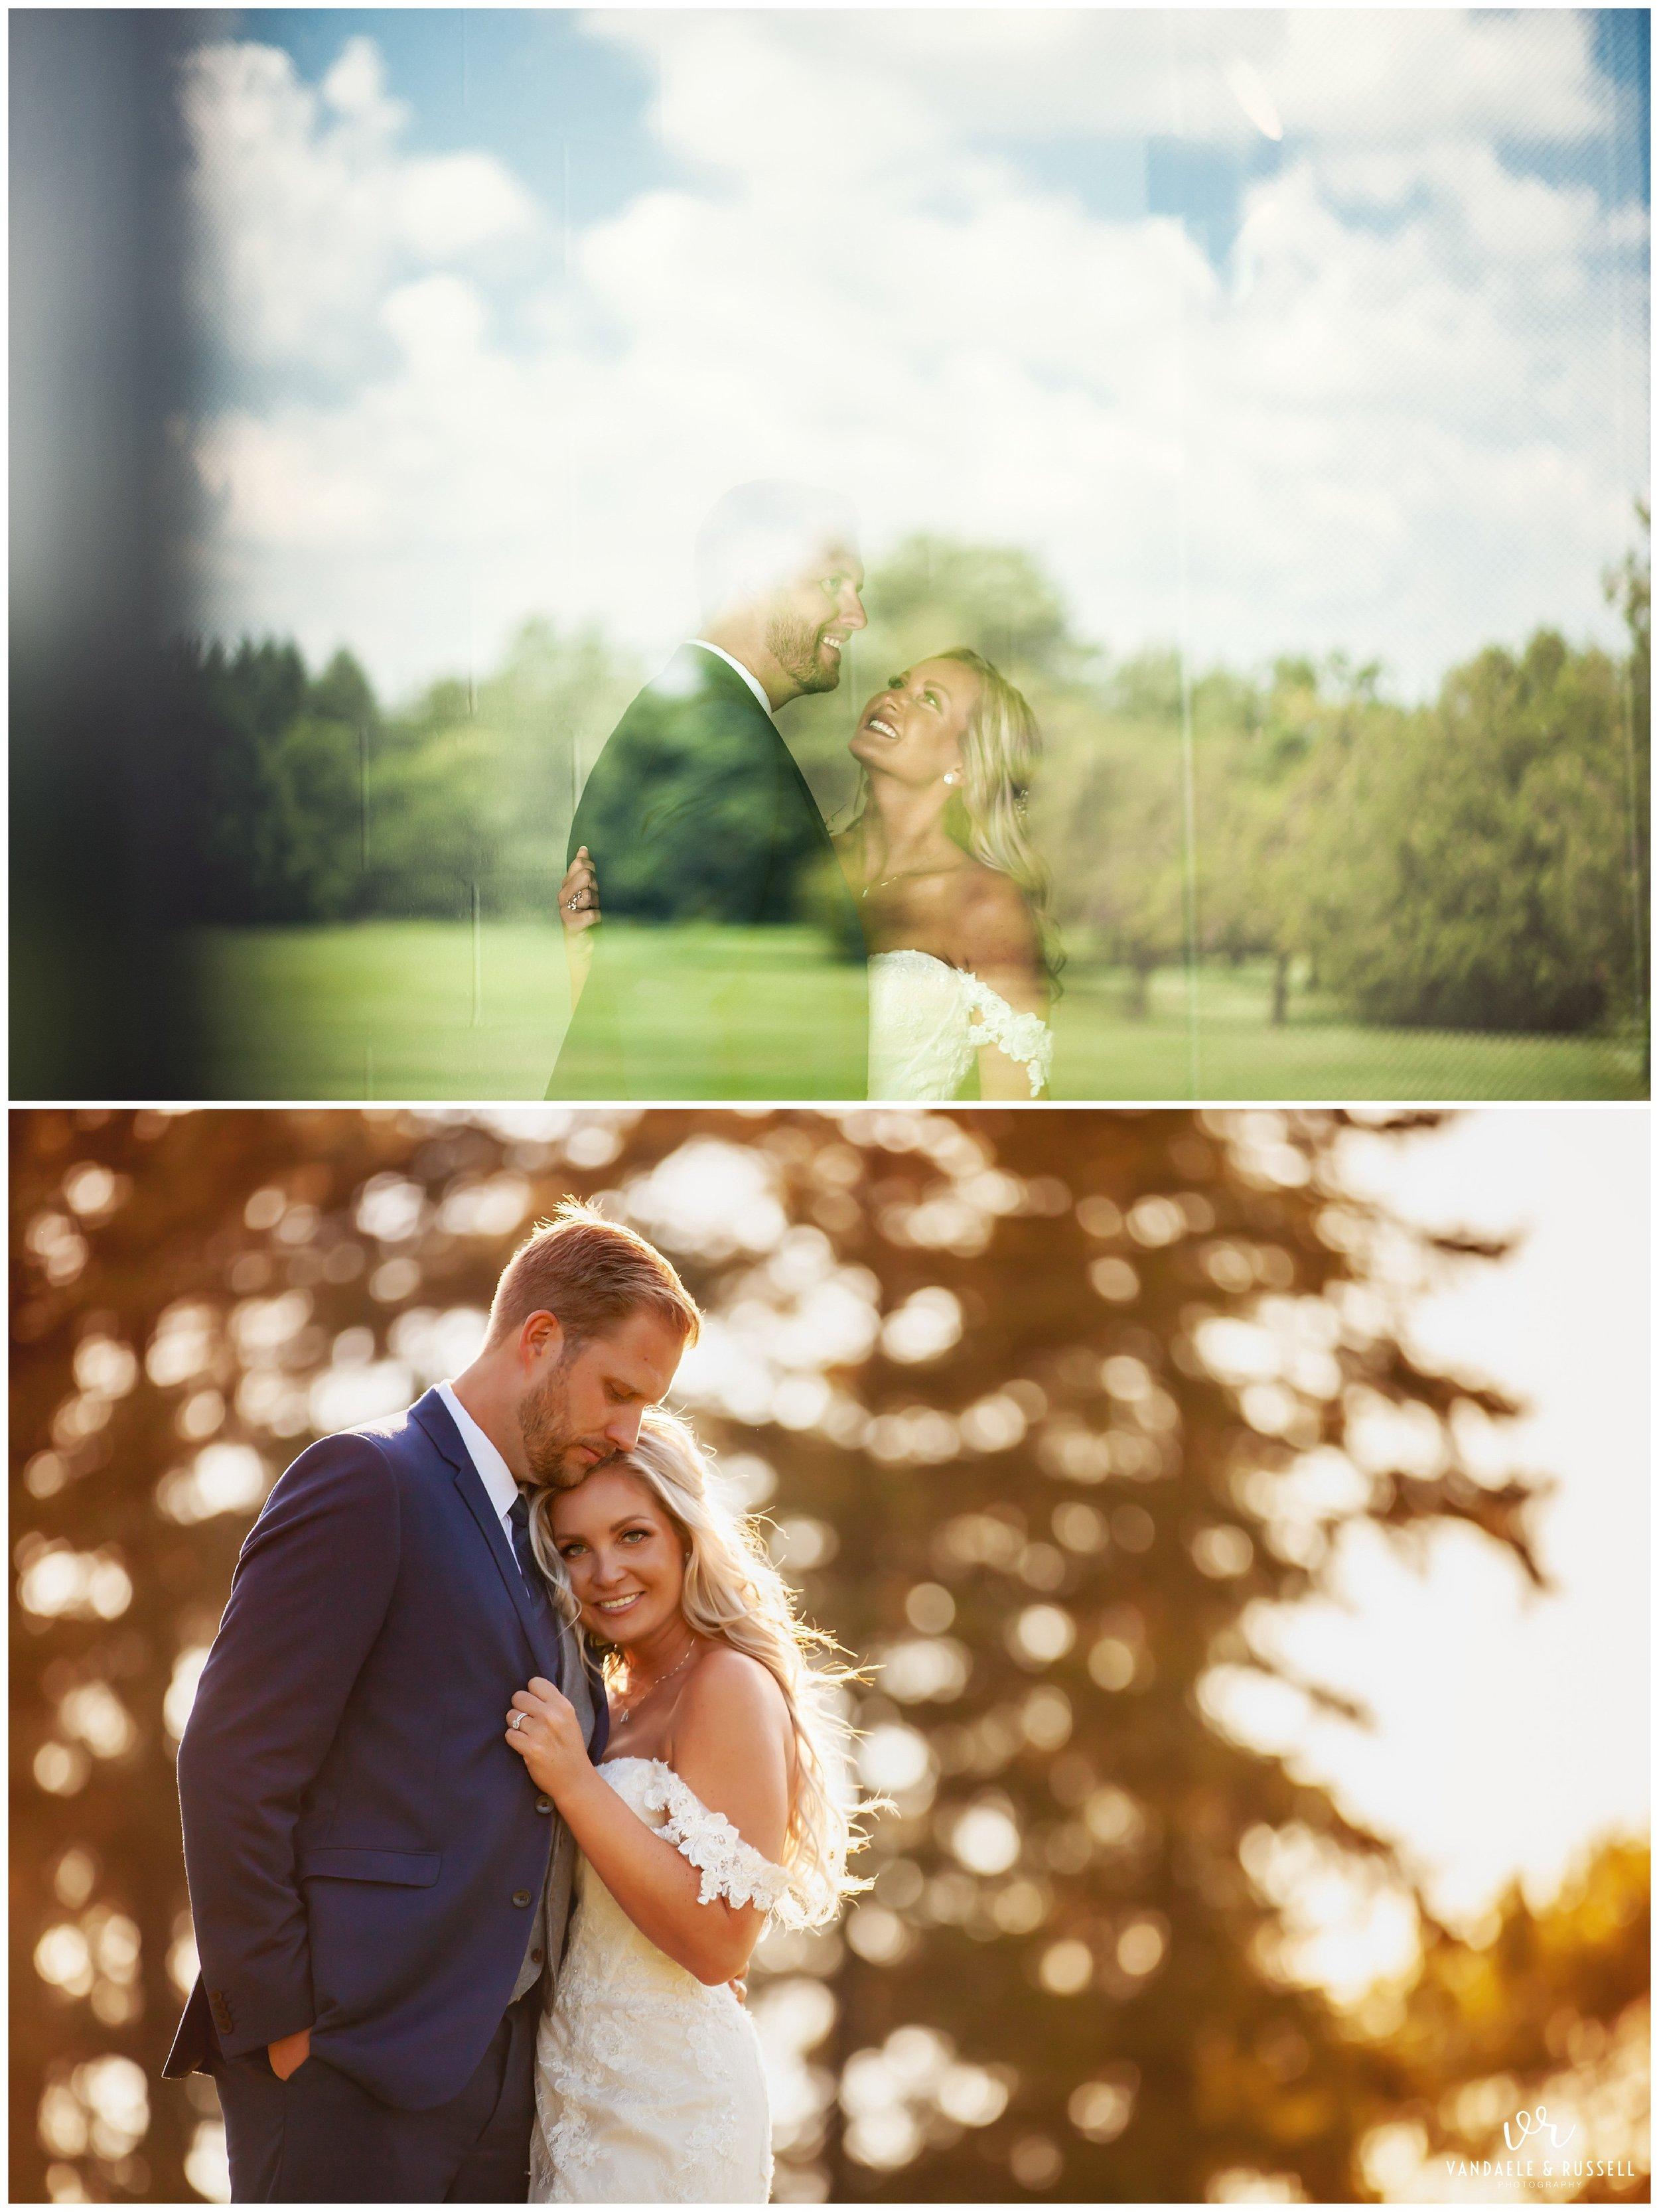 VanDaele-Russell-Wedding-Photography-London-Toronto-Ontario_0160.jpg